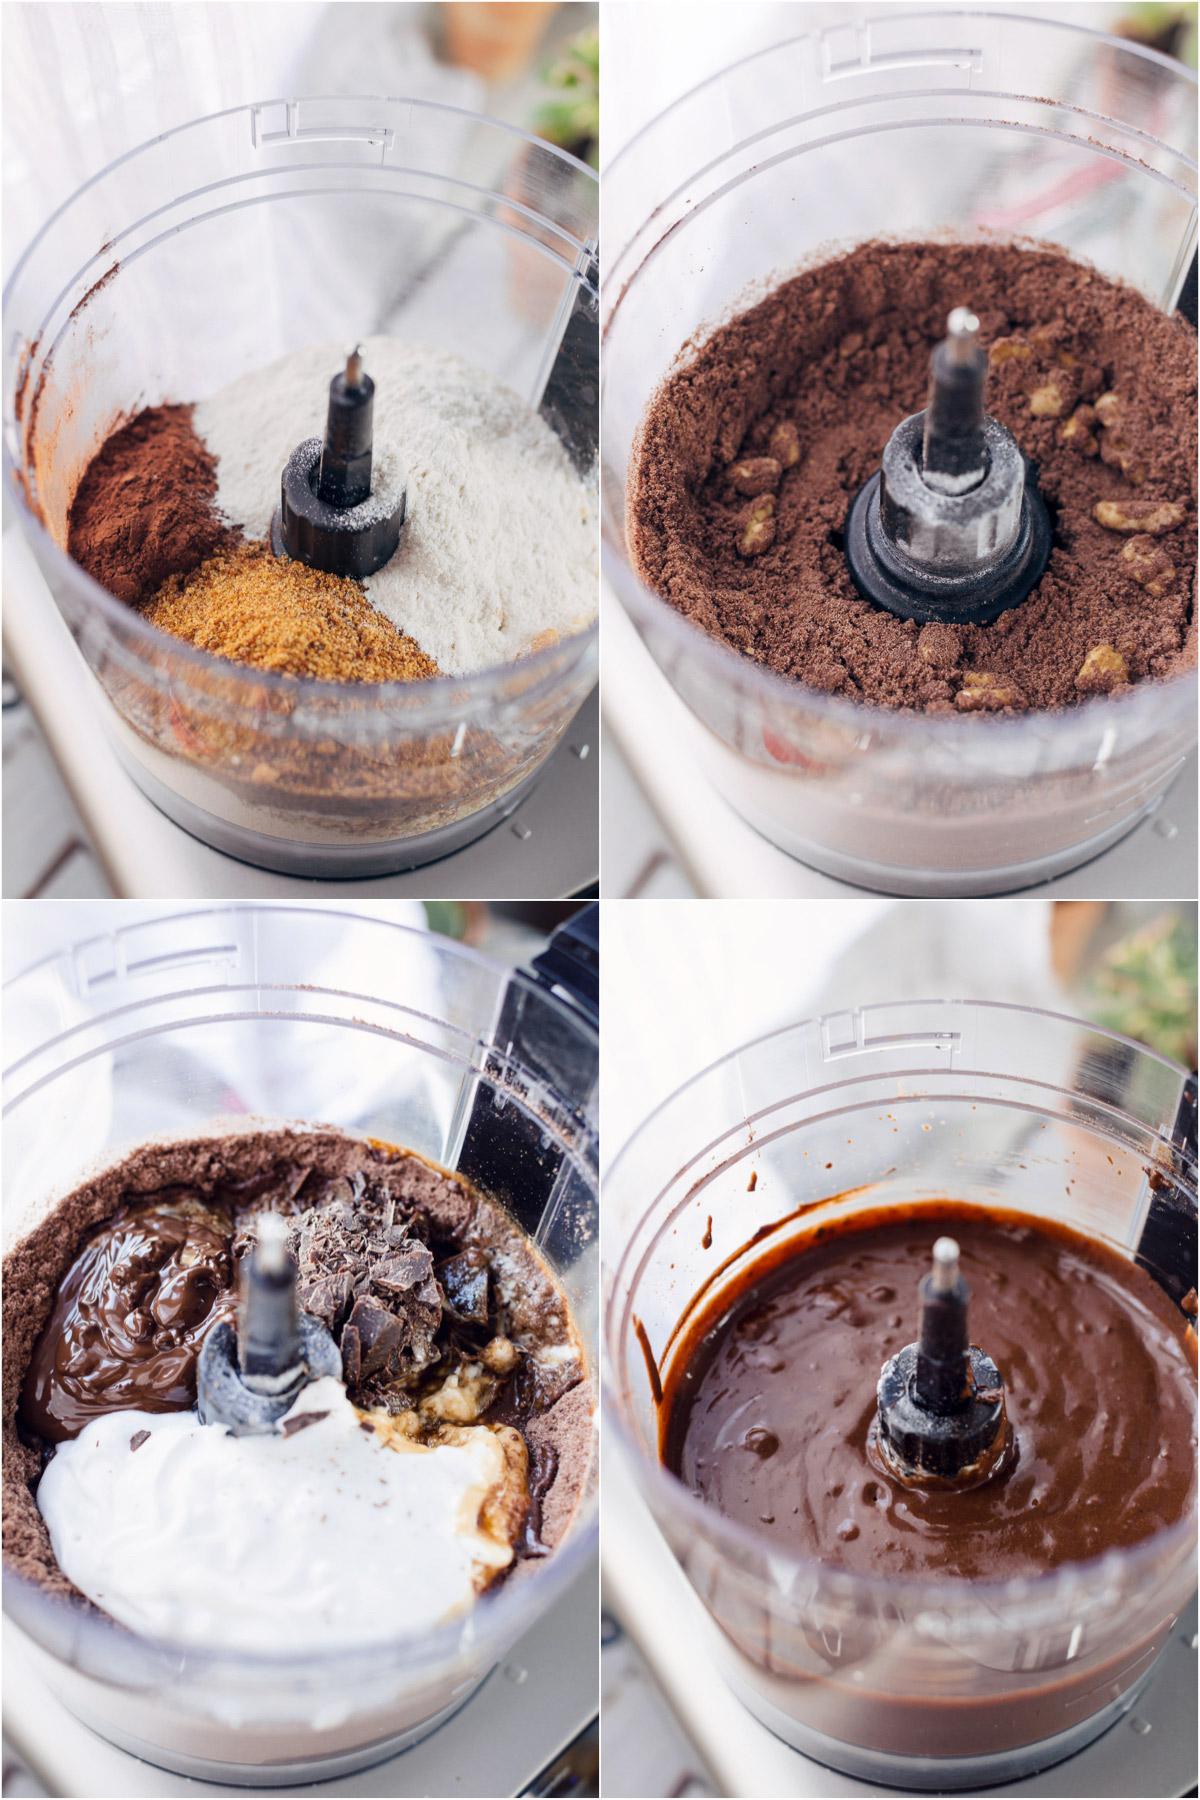 how to make healthy VEGAN GLUTENFREE BROWNIE recipe come preprare la ricetta BROWNIES VEGAN SENZA GLUTINE facili light sani senza farine raffinate senza zuccheri raffinati simple